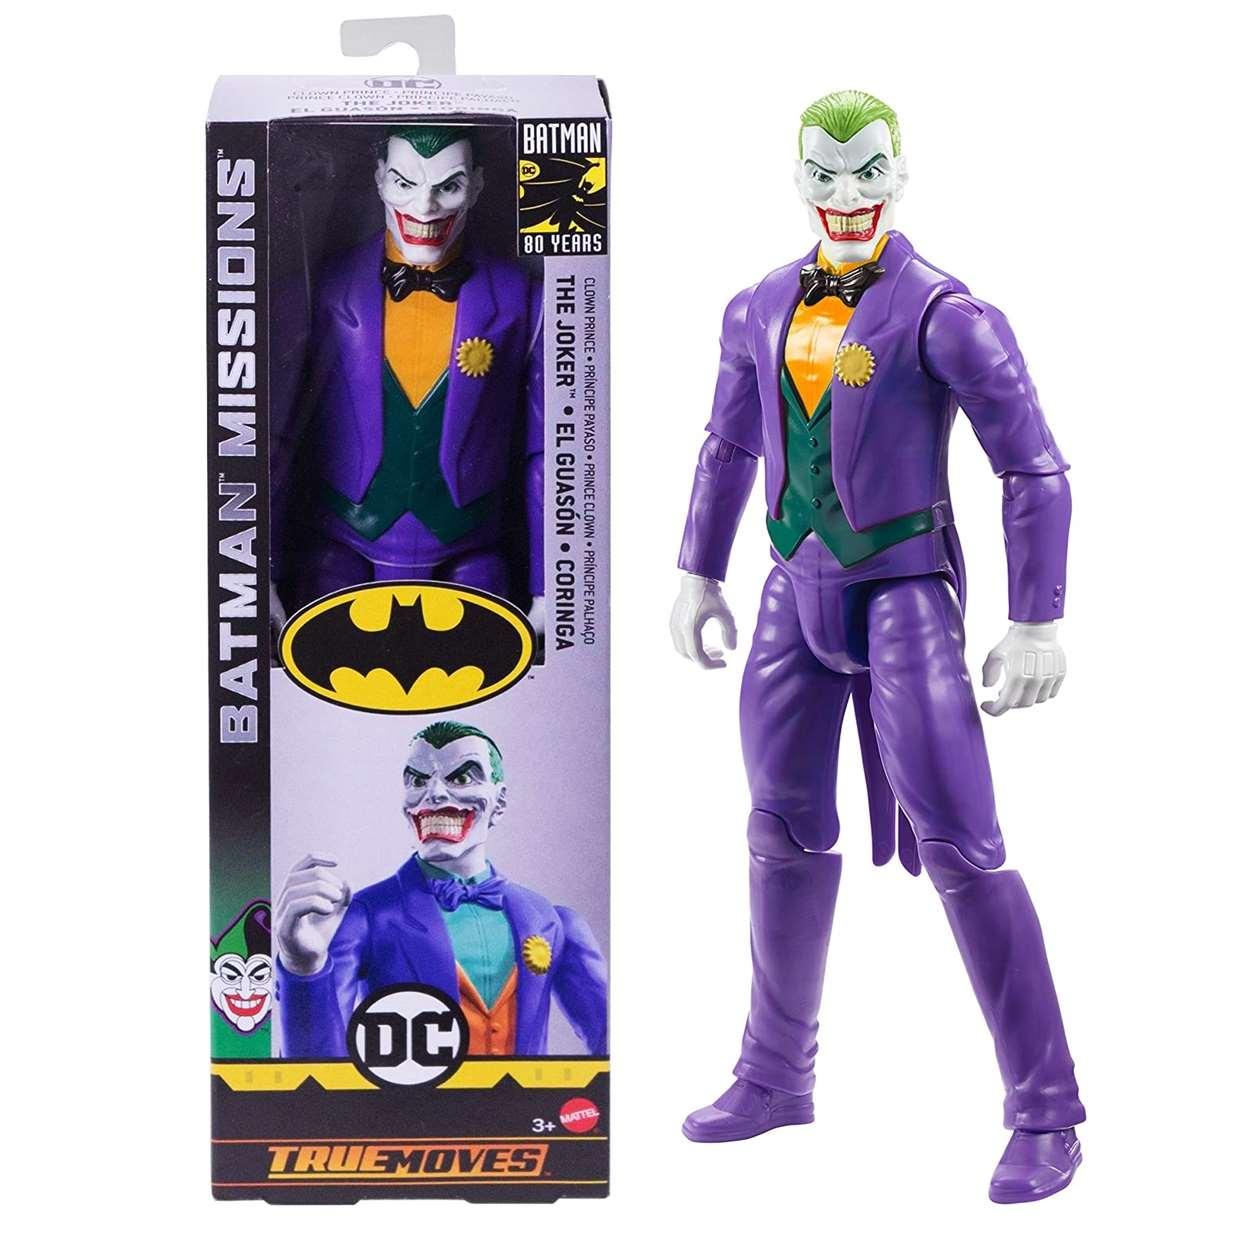 The Joker Clown Prince Figura Batman Missions True Moves  12 Pulg